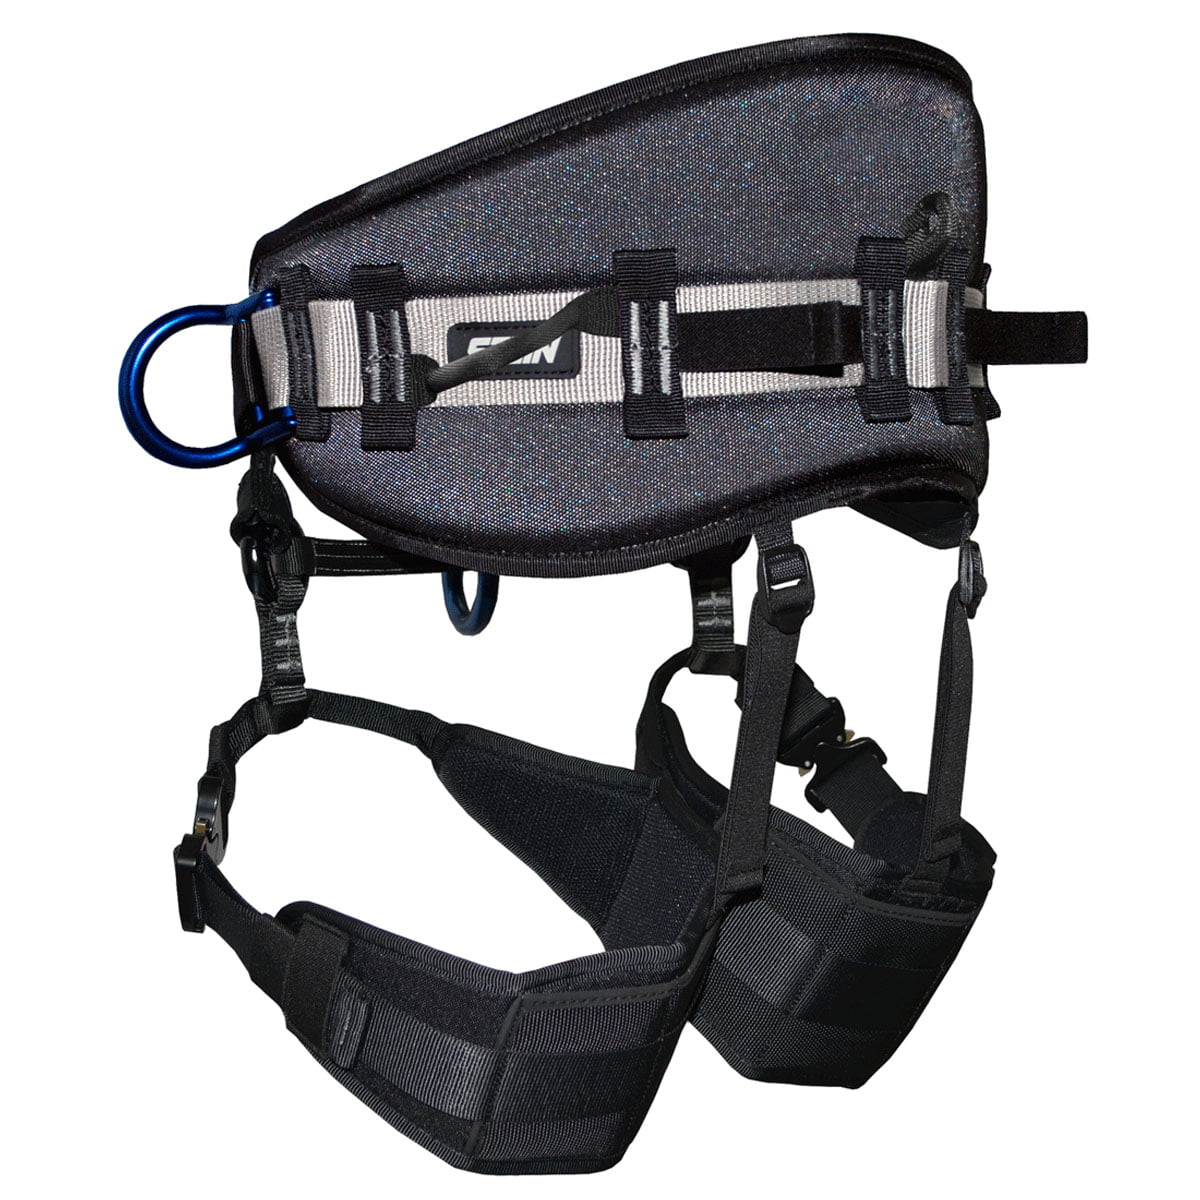 Stein Vega Plus Harness